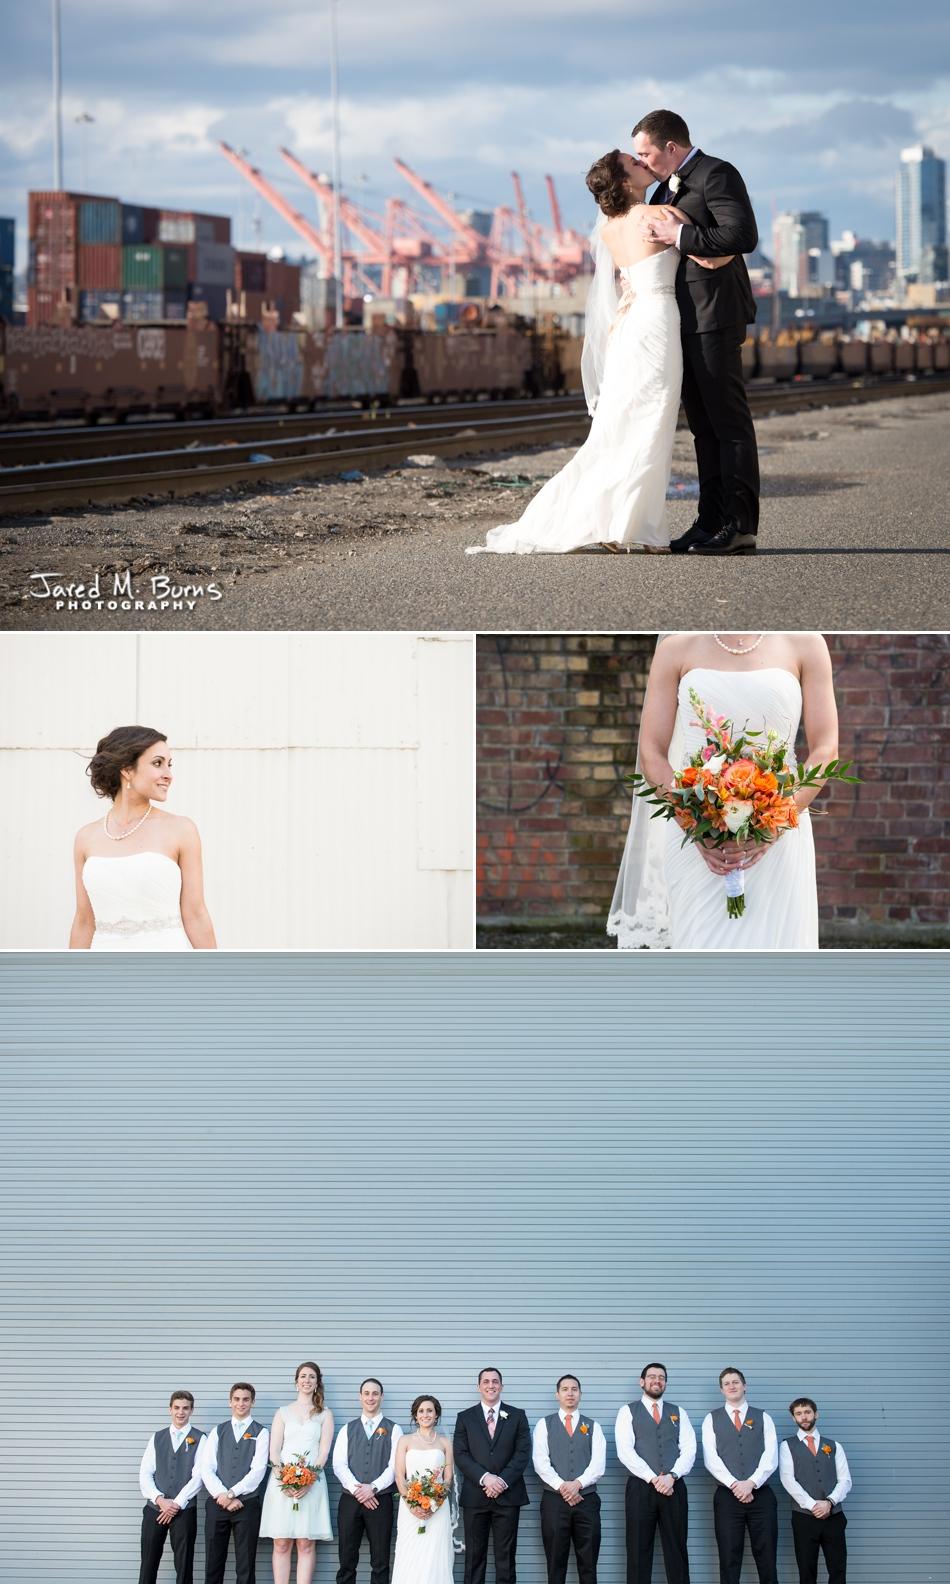 Seattle Wedding Photographer, Jared M. Burns - Sodo wedding near Seattle train yards